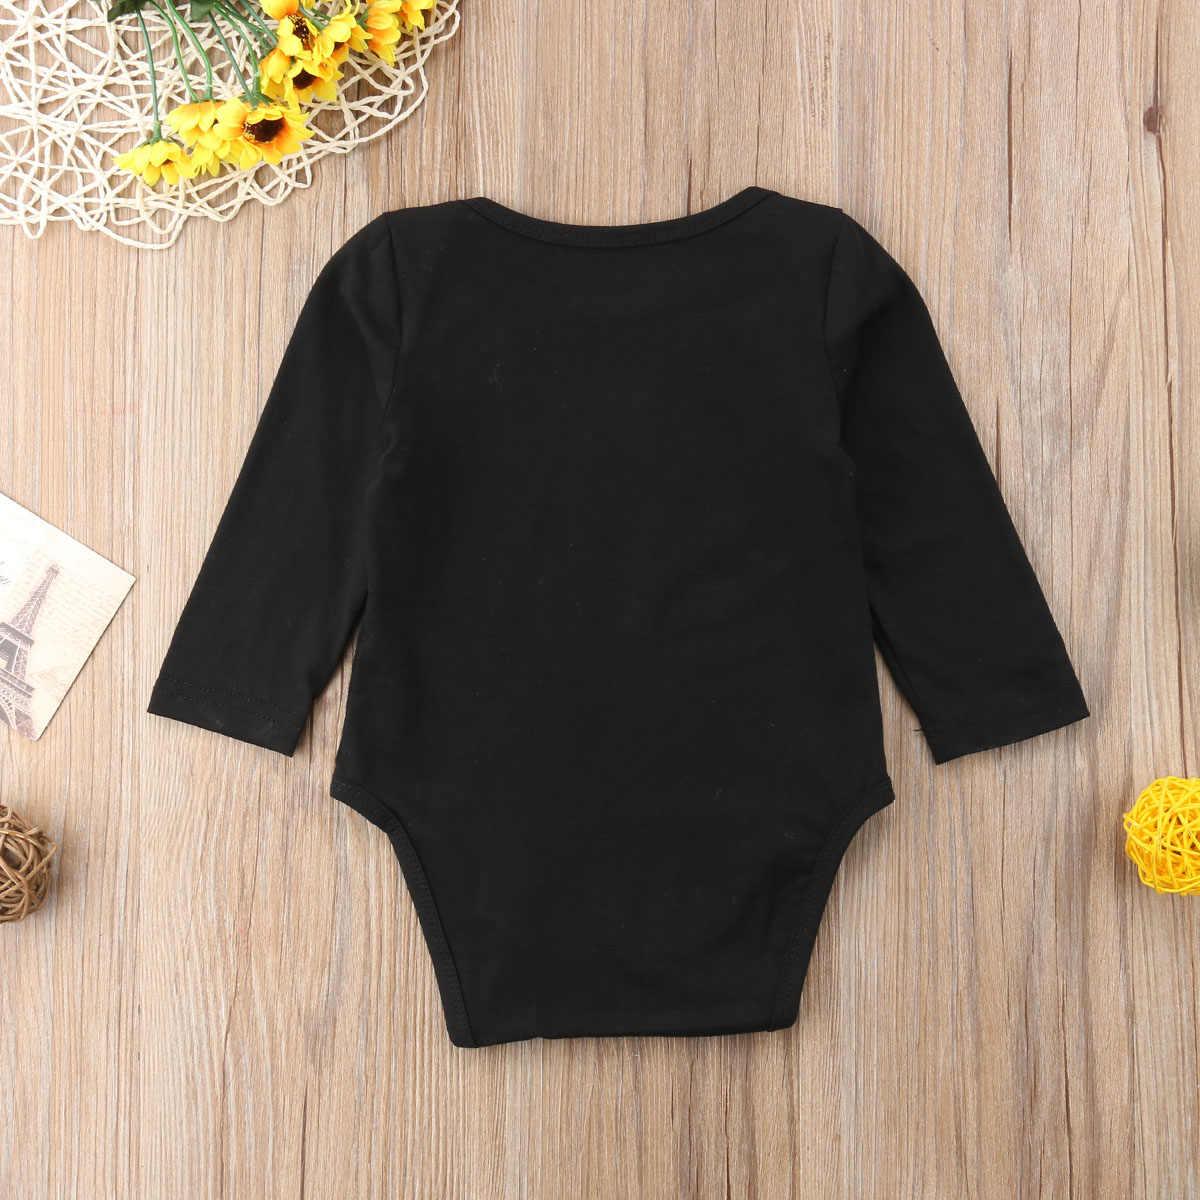 2018 Brand New Newborn Baby Girl Boy Halloween Bodysuit Long Sleeve Cartoon Black Jumpsuit Casual Playsuit Pumpkin Clothes 0-18M